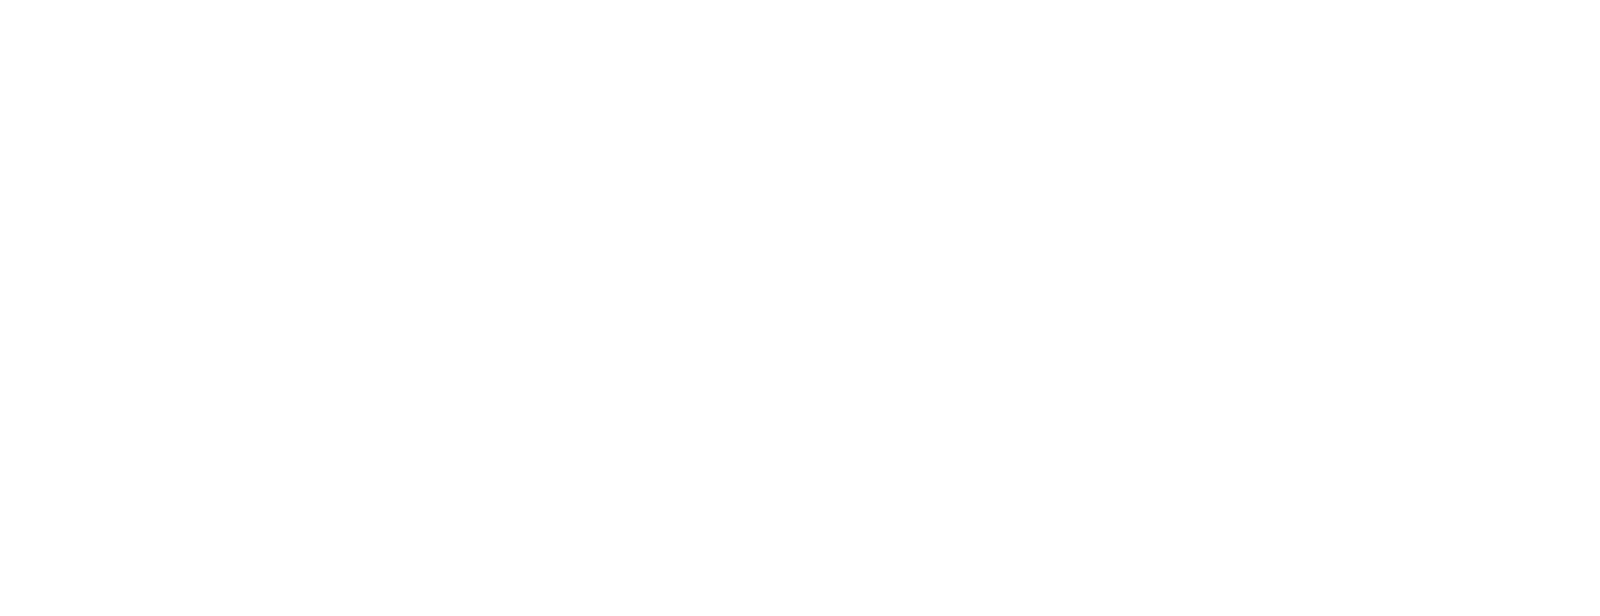 Groupe BPCE>